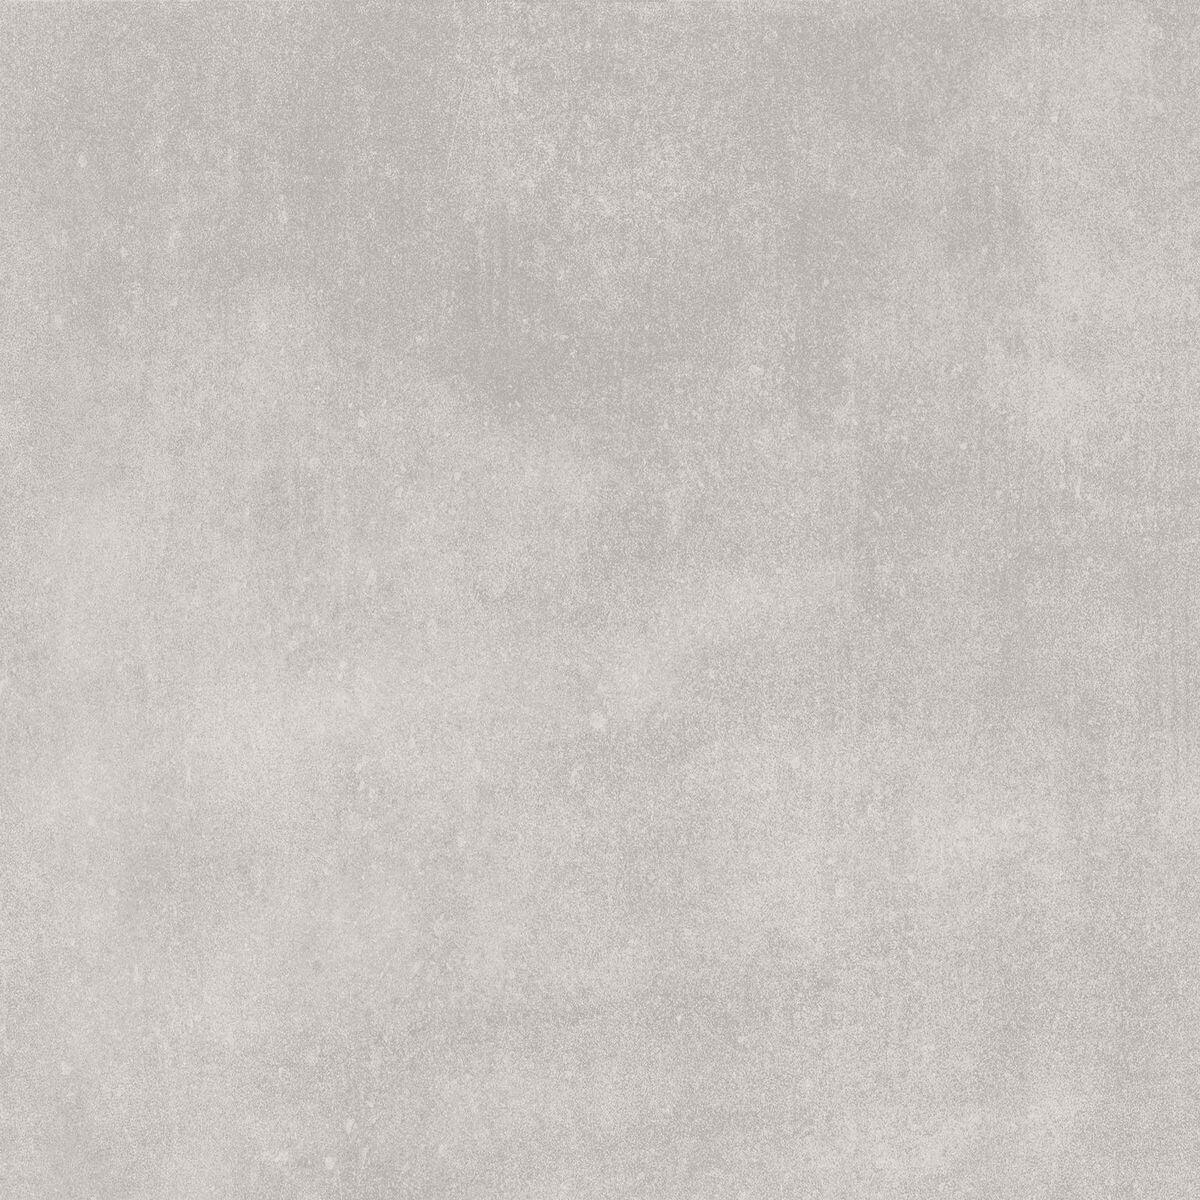 Ceramic Industries Soho Grey Eco 600x600mm_Stiles_Product_Image